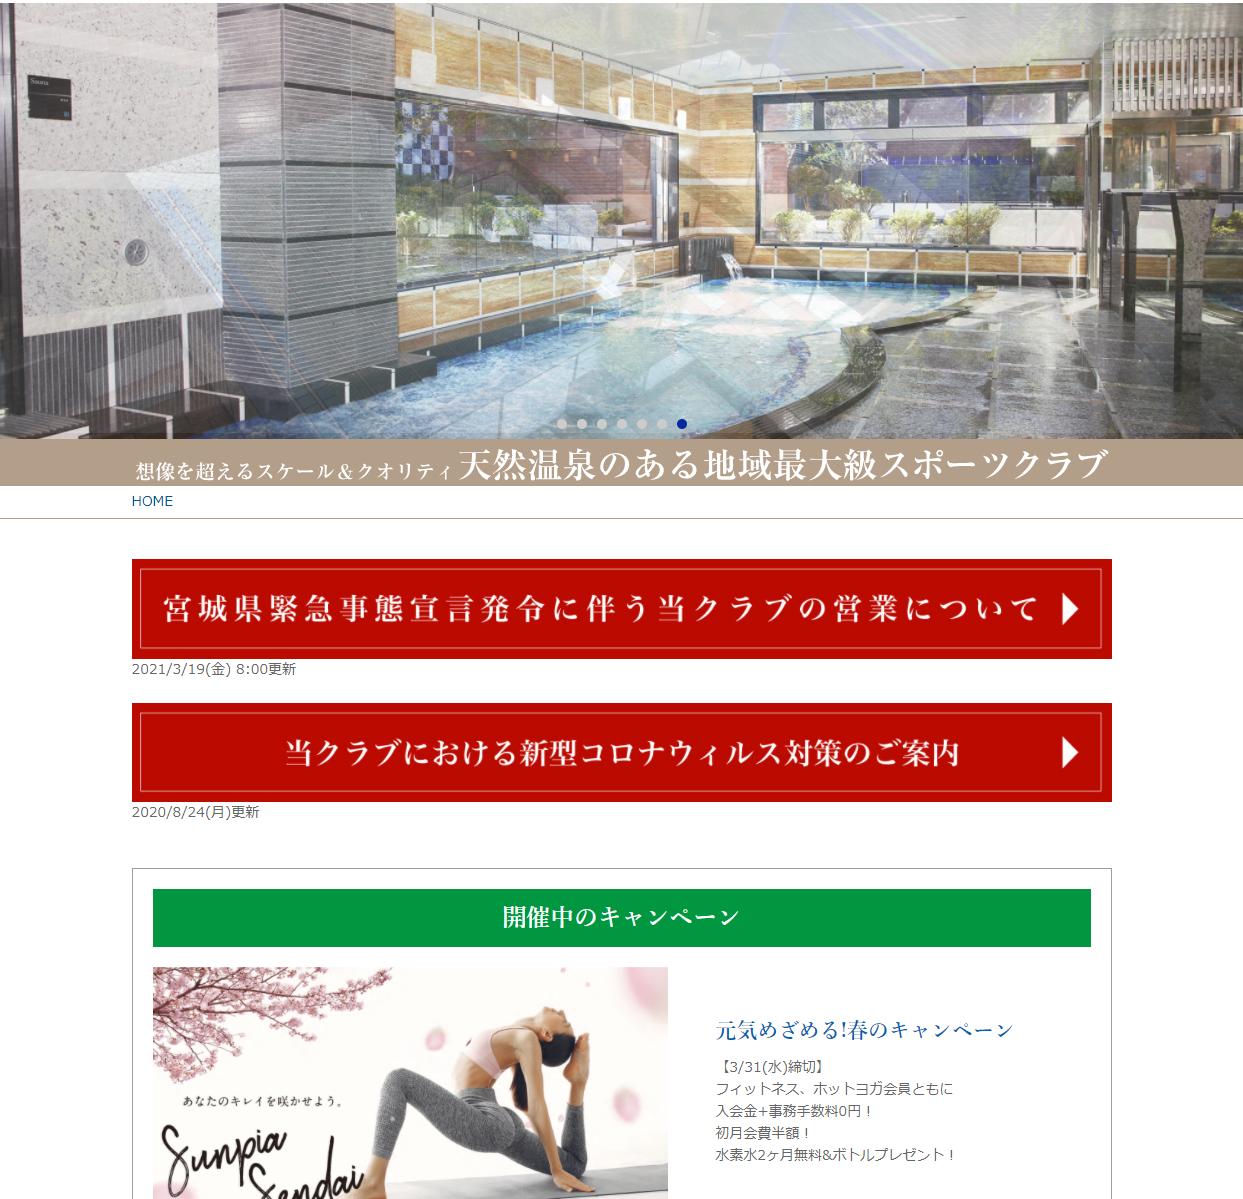 "<span class=""title"">サンピアスポーツクラブ仙台の口コミや評判</span>"